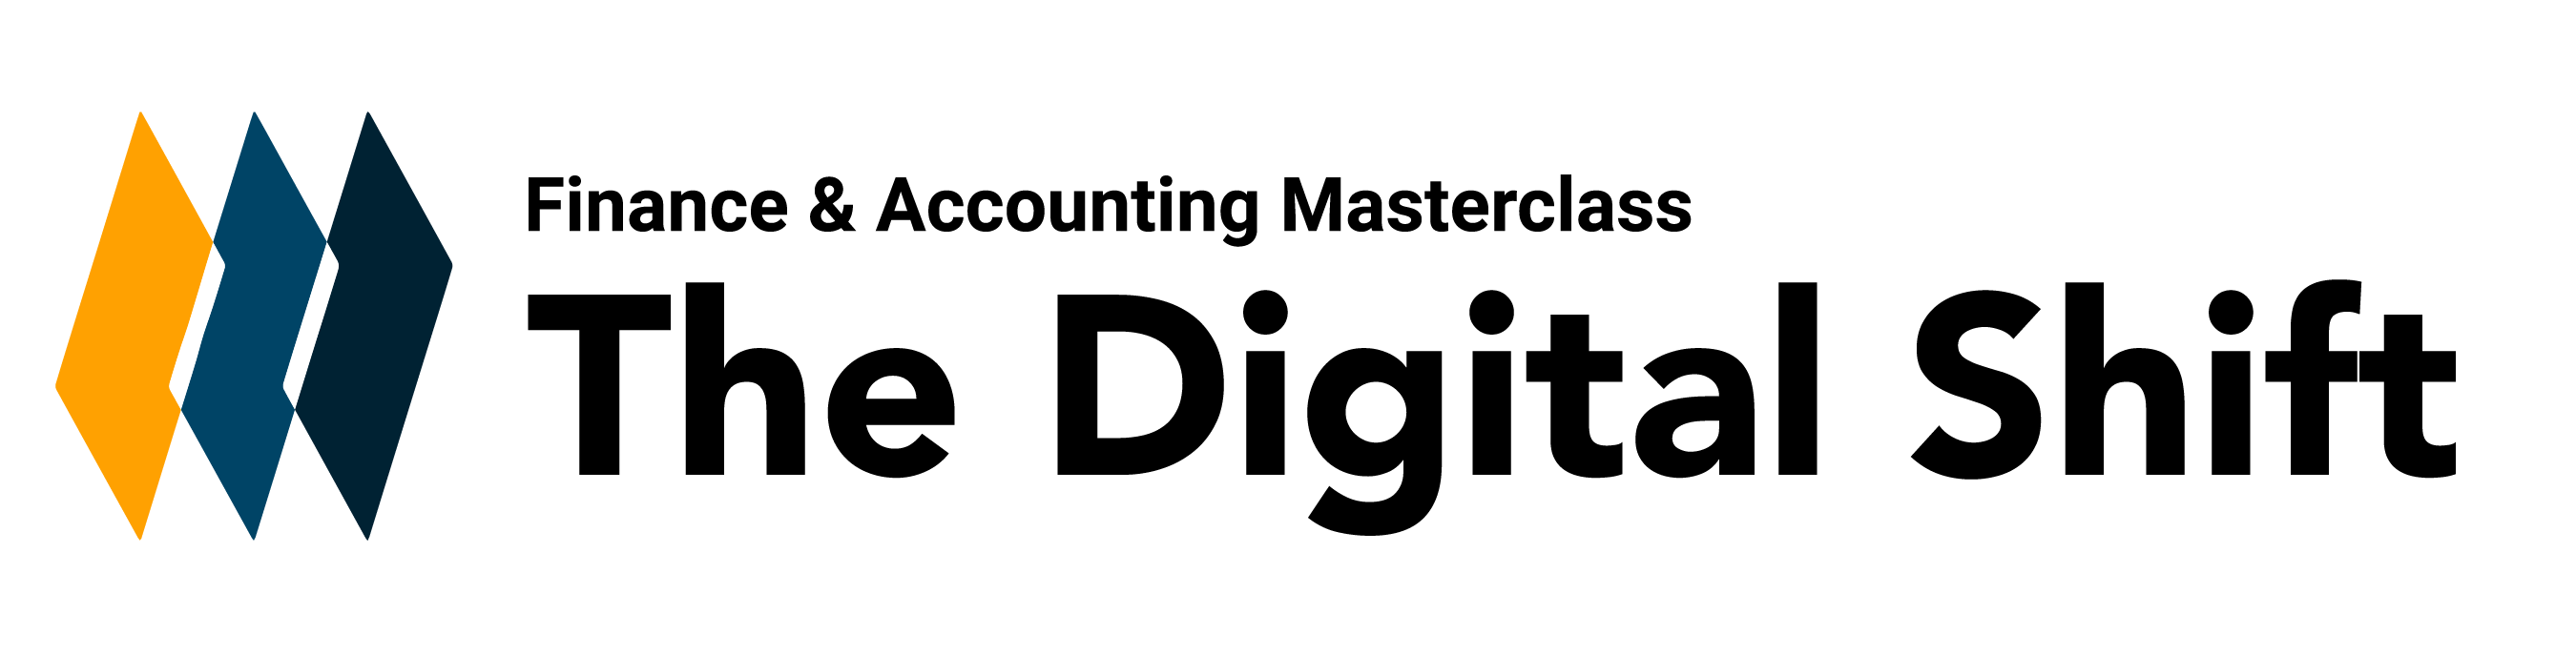 the-digital-shift-logo-long@2x